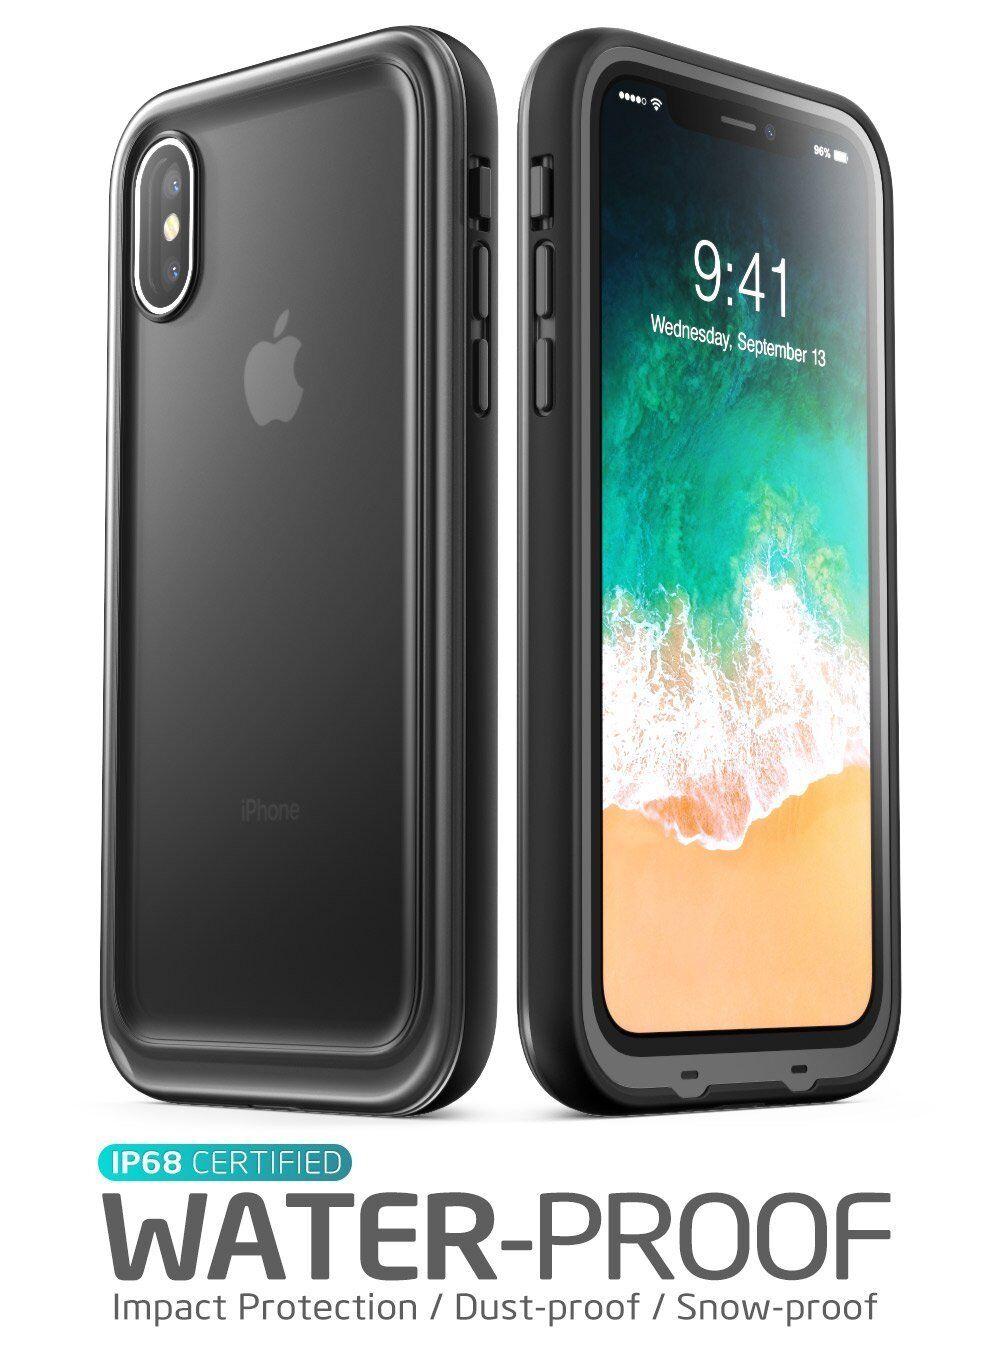 iPhone X Case i-Blason Aegis Waterproof Full-body Cover iPhone 10 2017